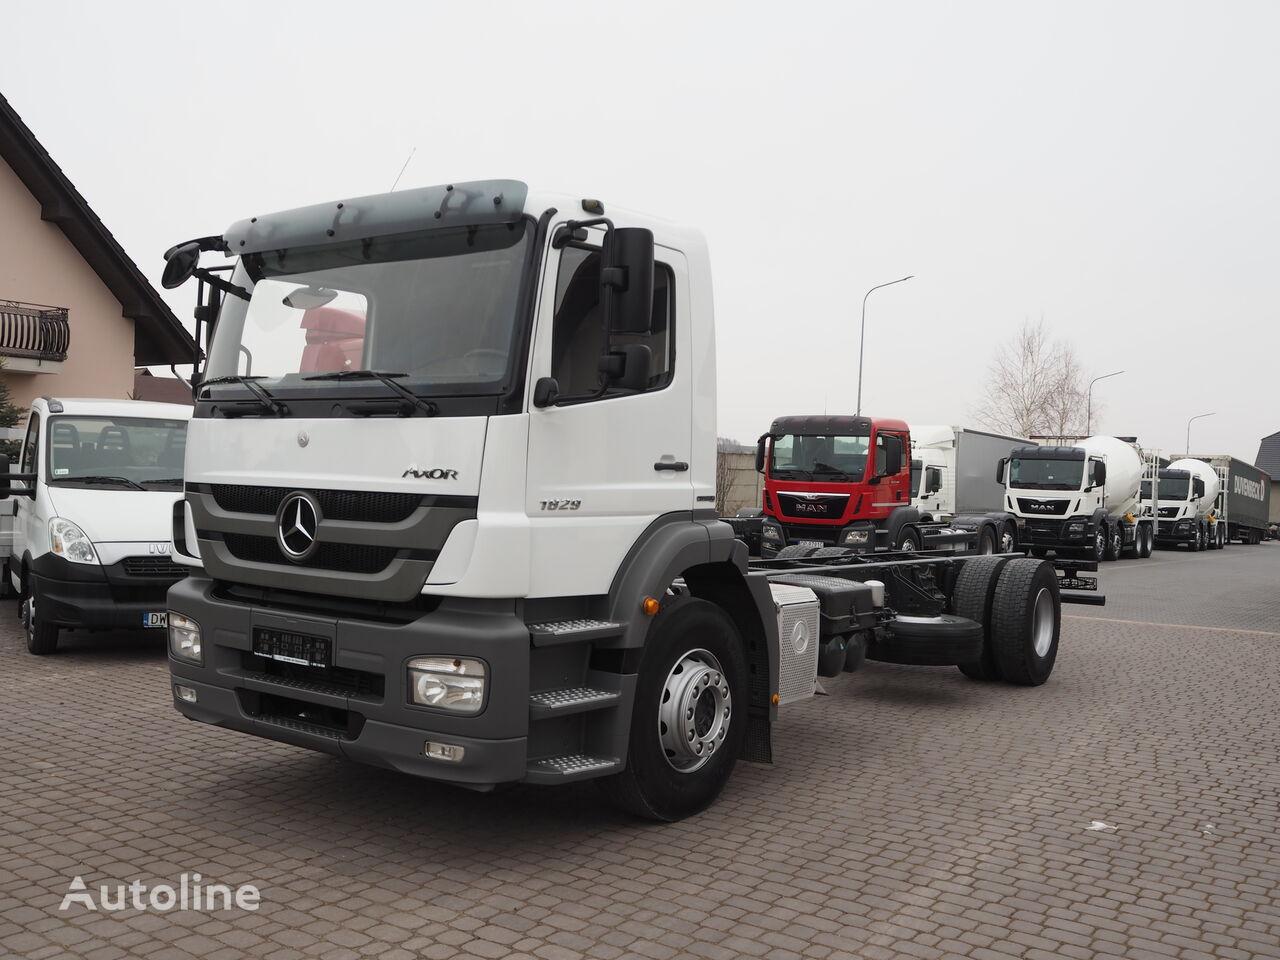 MERCEDES-BENZ AXOR 1829 MANUAL RAMA DO ZABUDOWY chassis truck